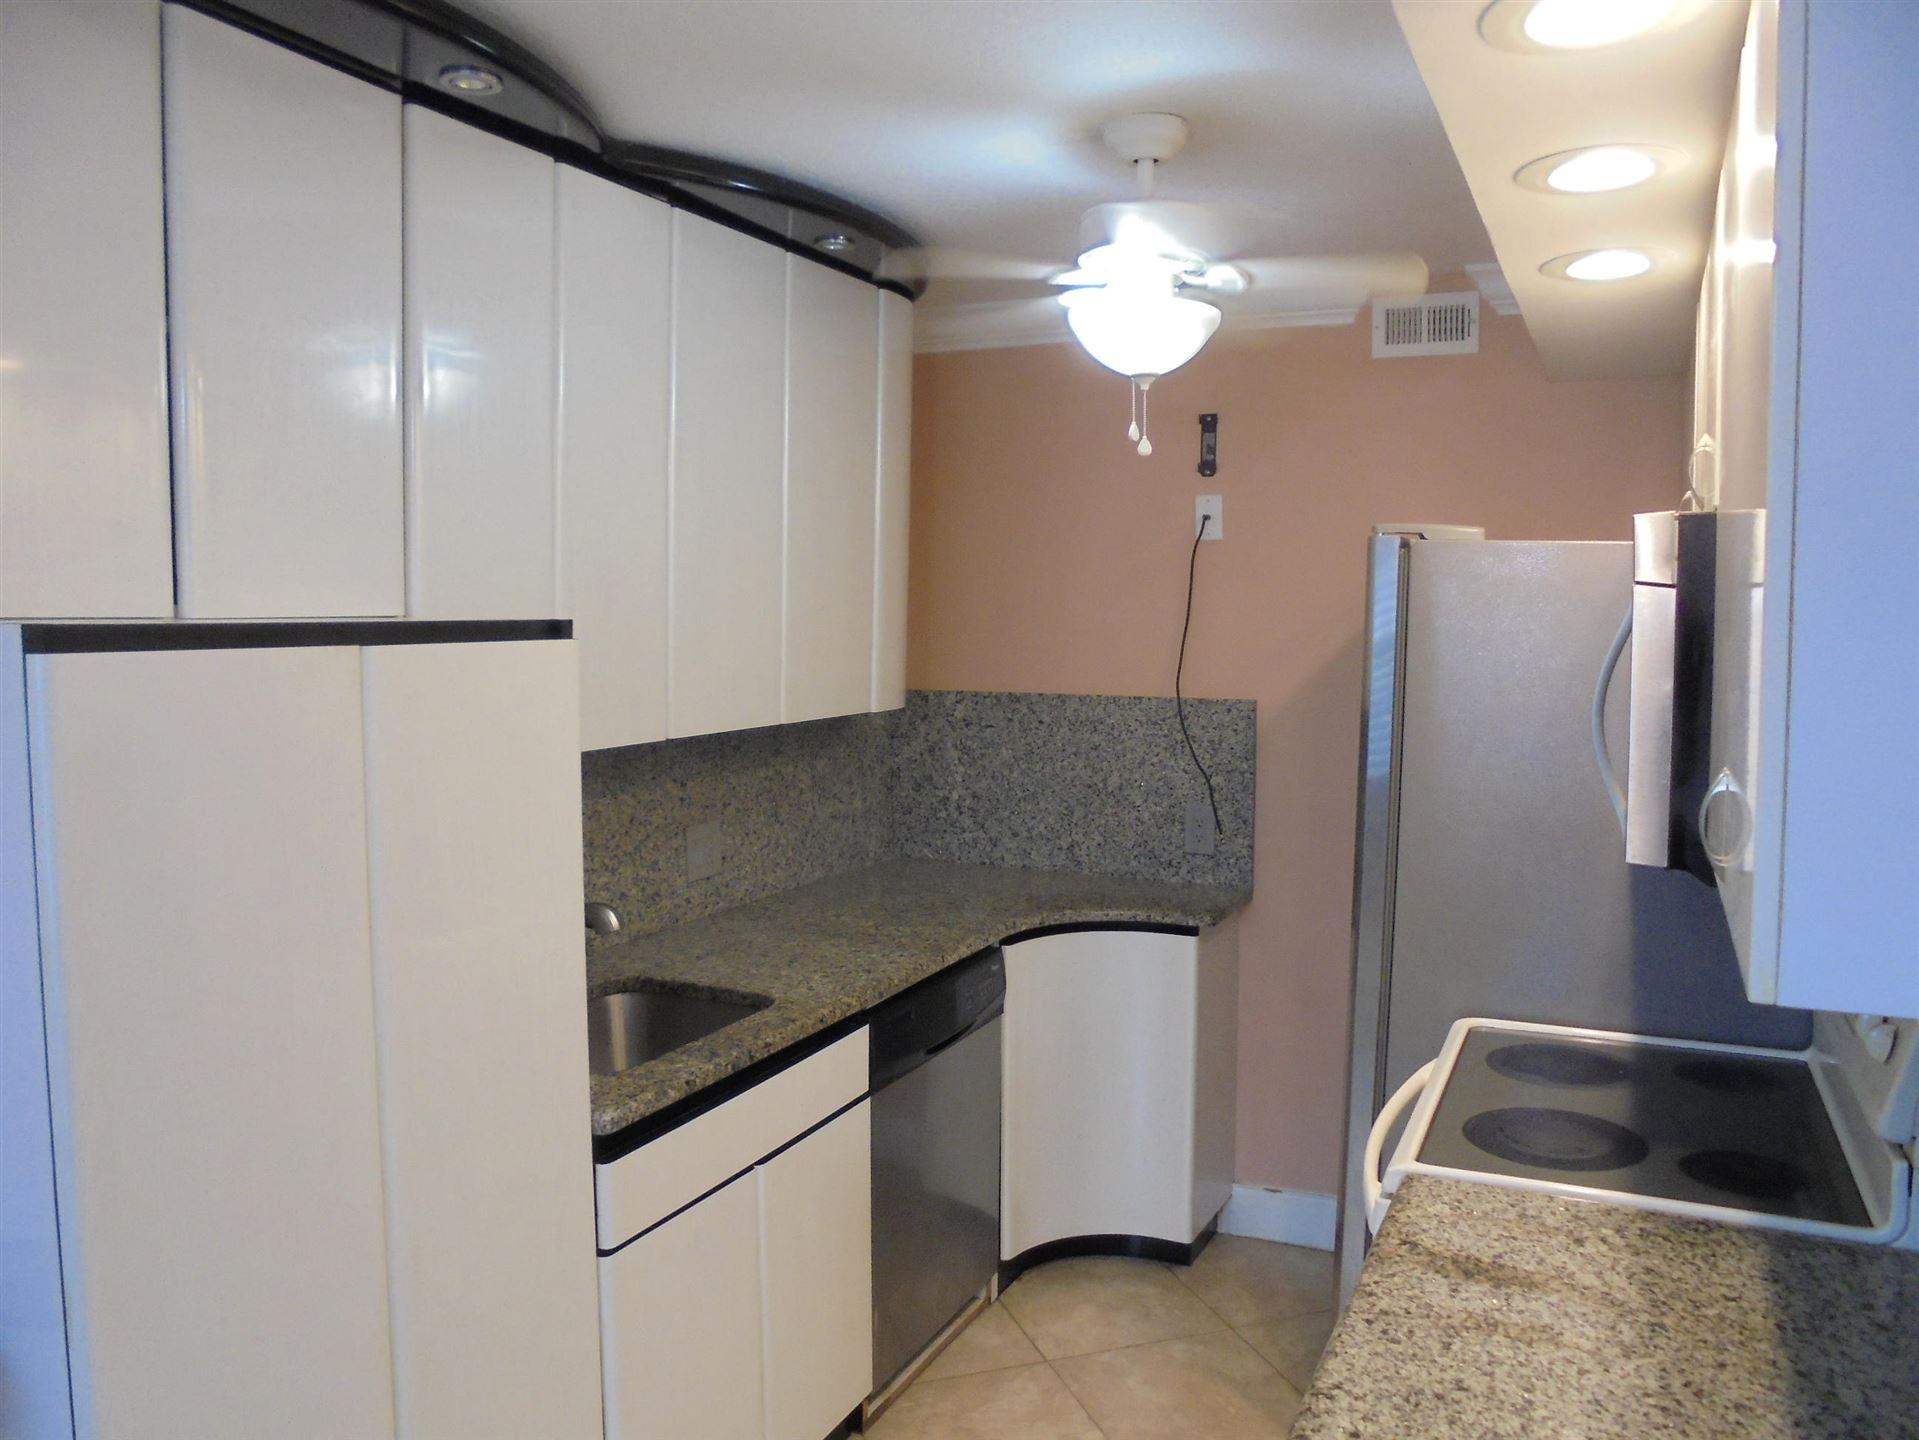 3042 Exeter C, Boca Raton, FL 33434 - MLS#: RX-10601764